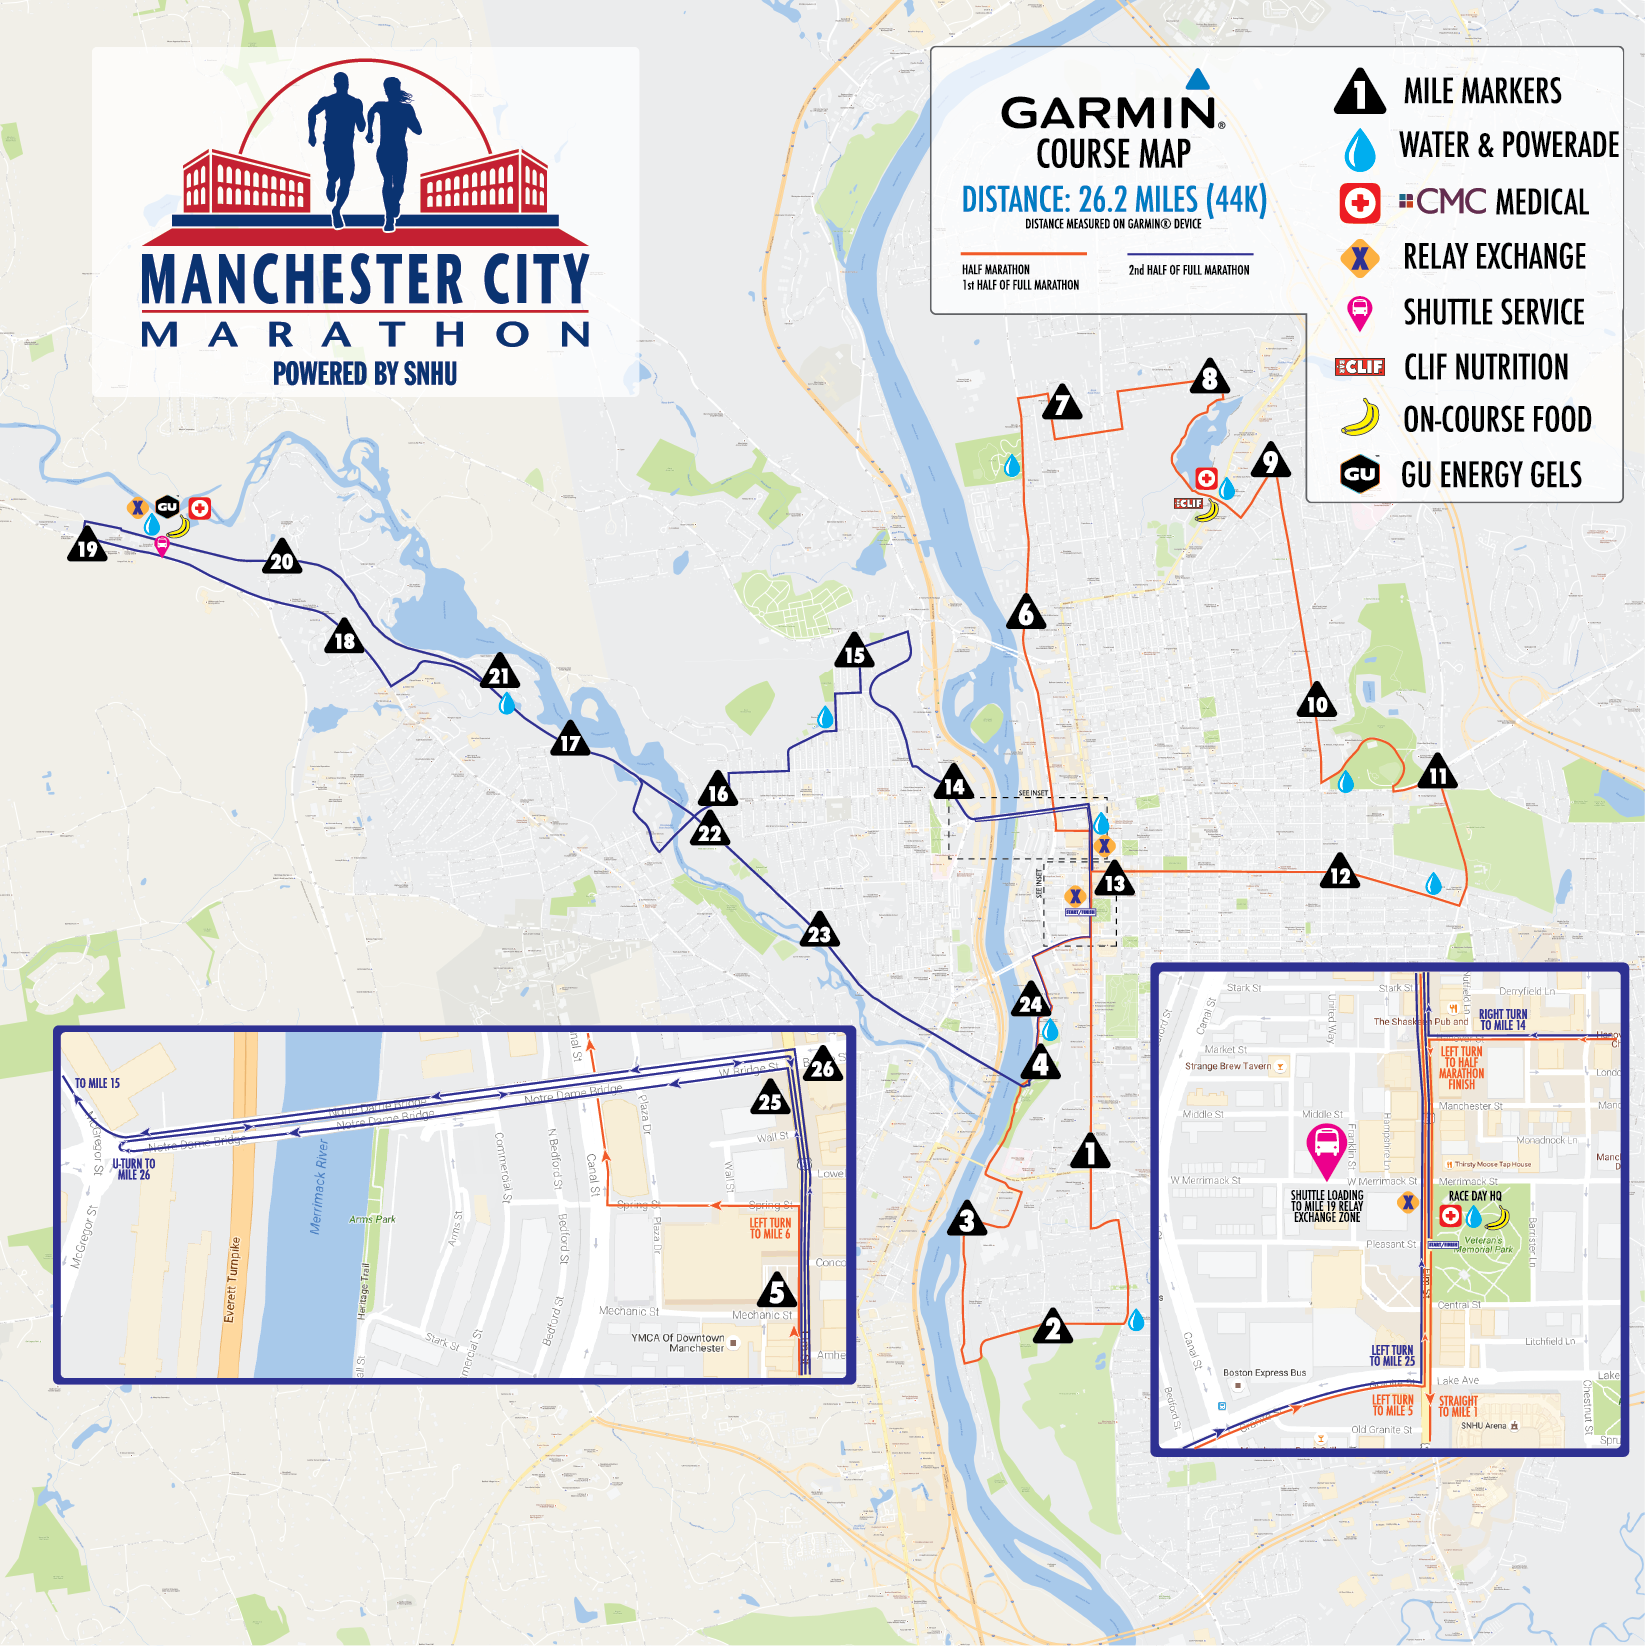 Manchester City Marathon powered by SNHU - MillenniumRunning.com